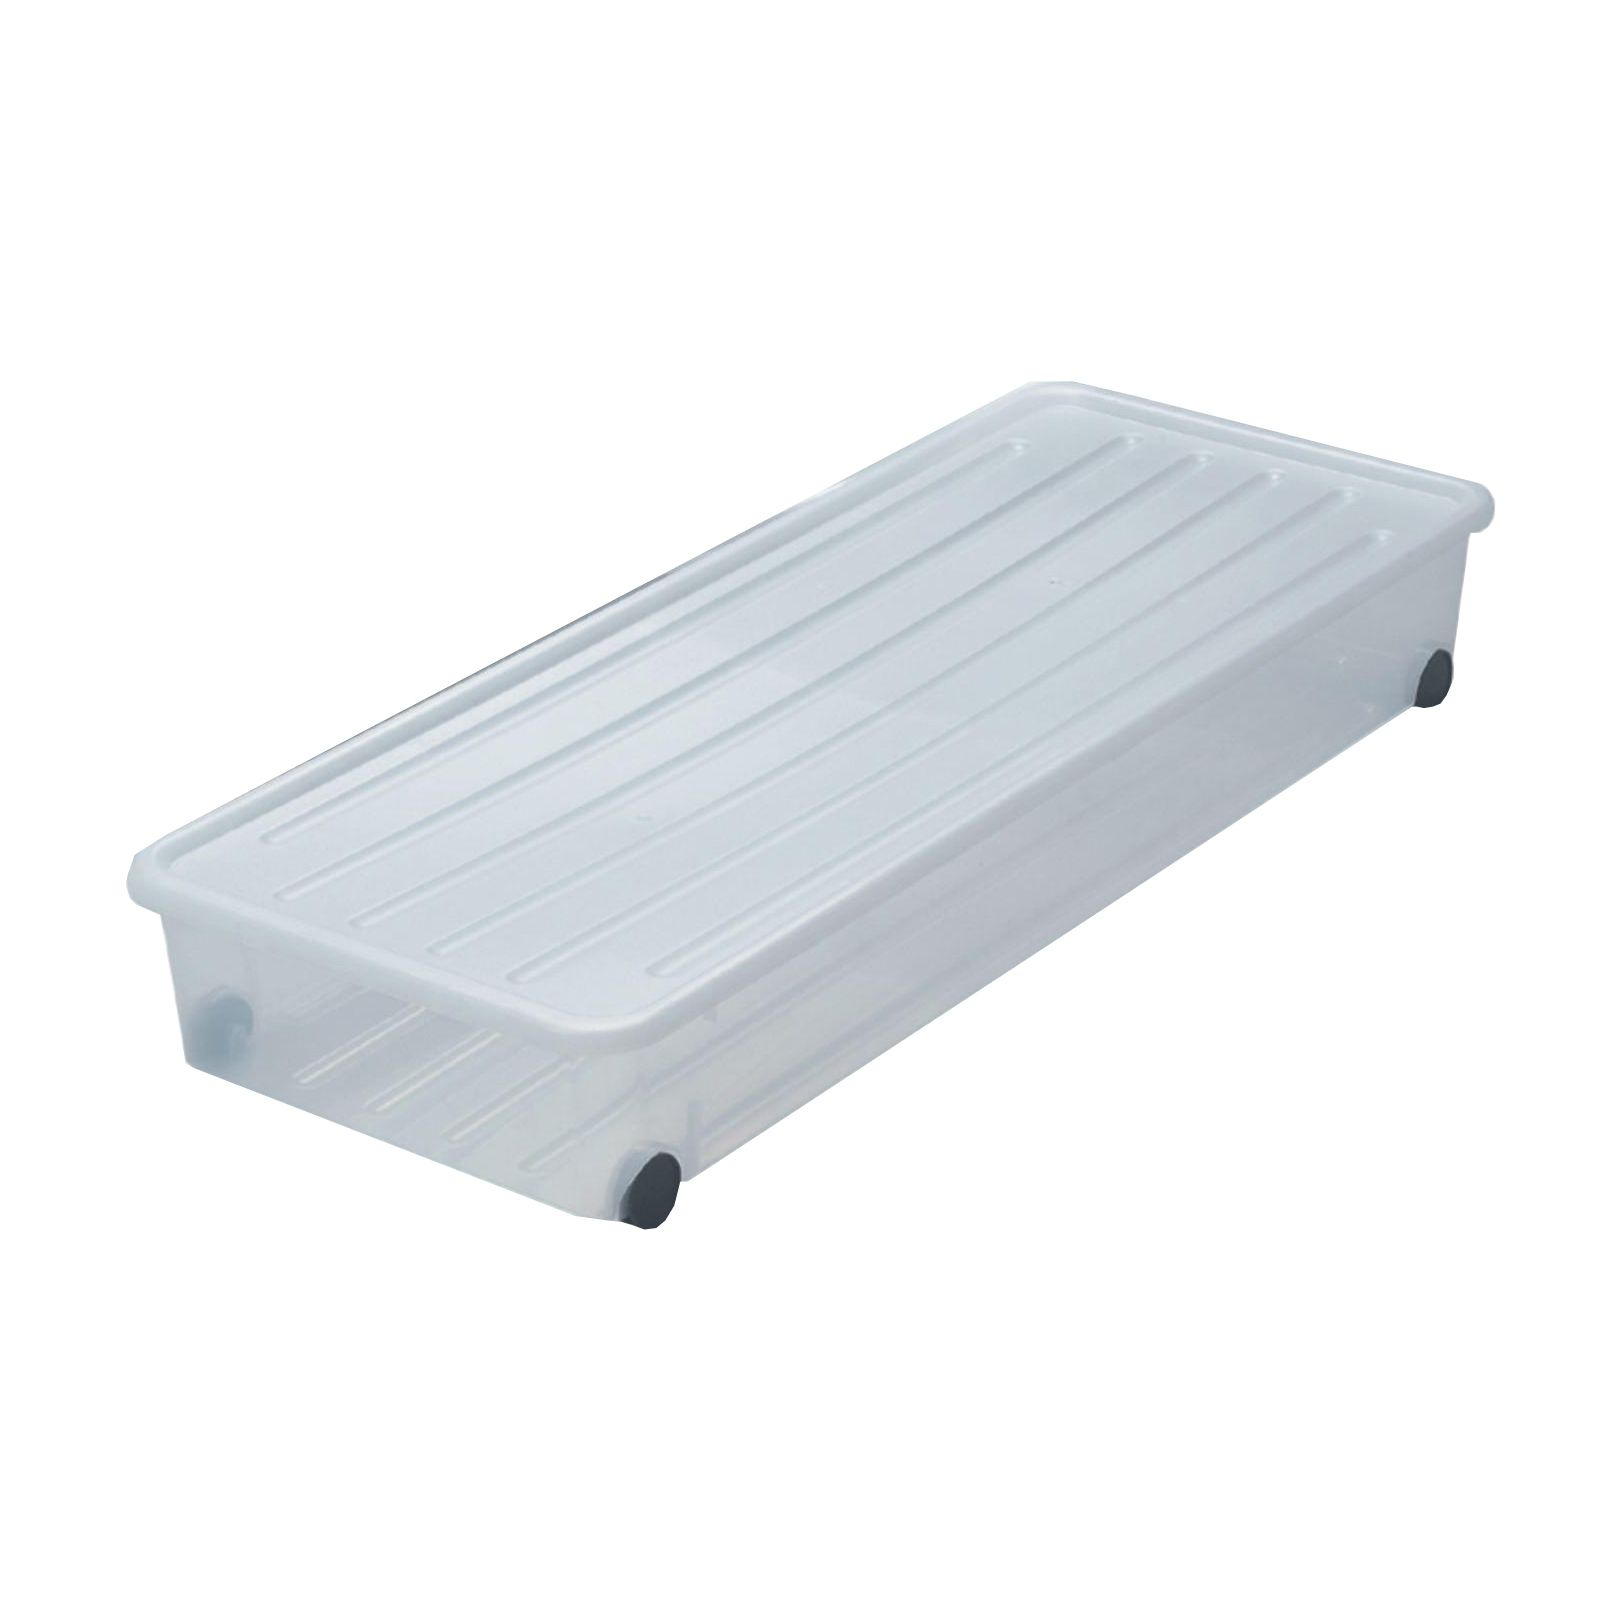 bac rangement sous lit